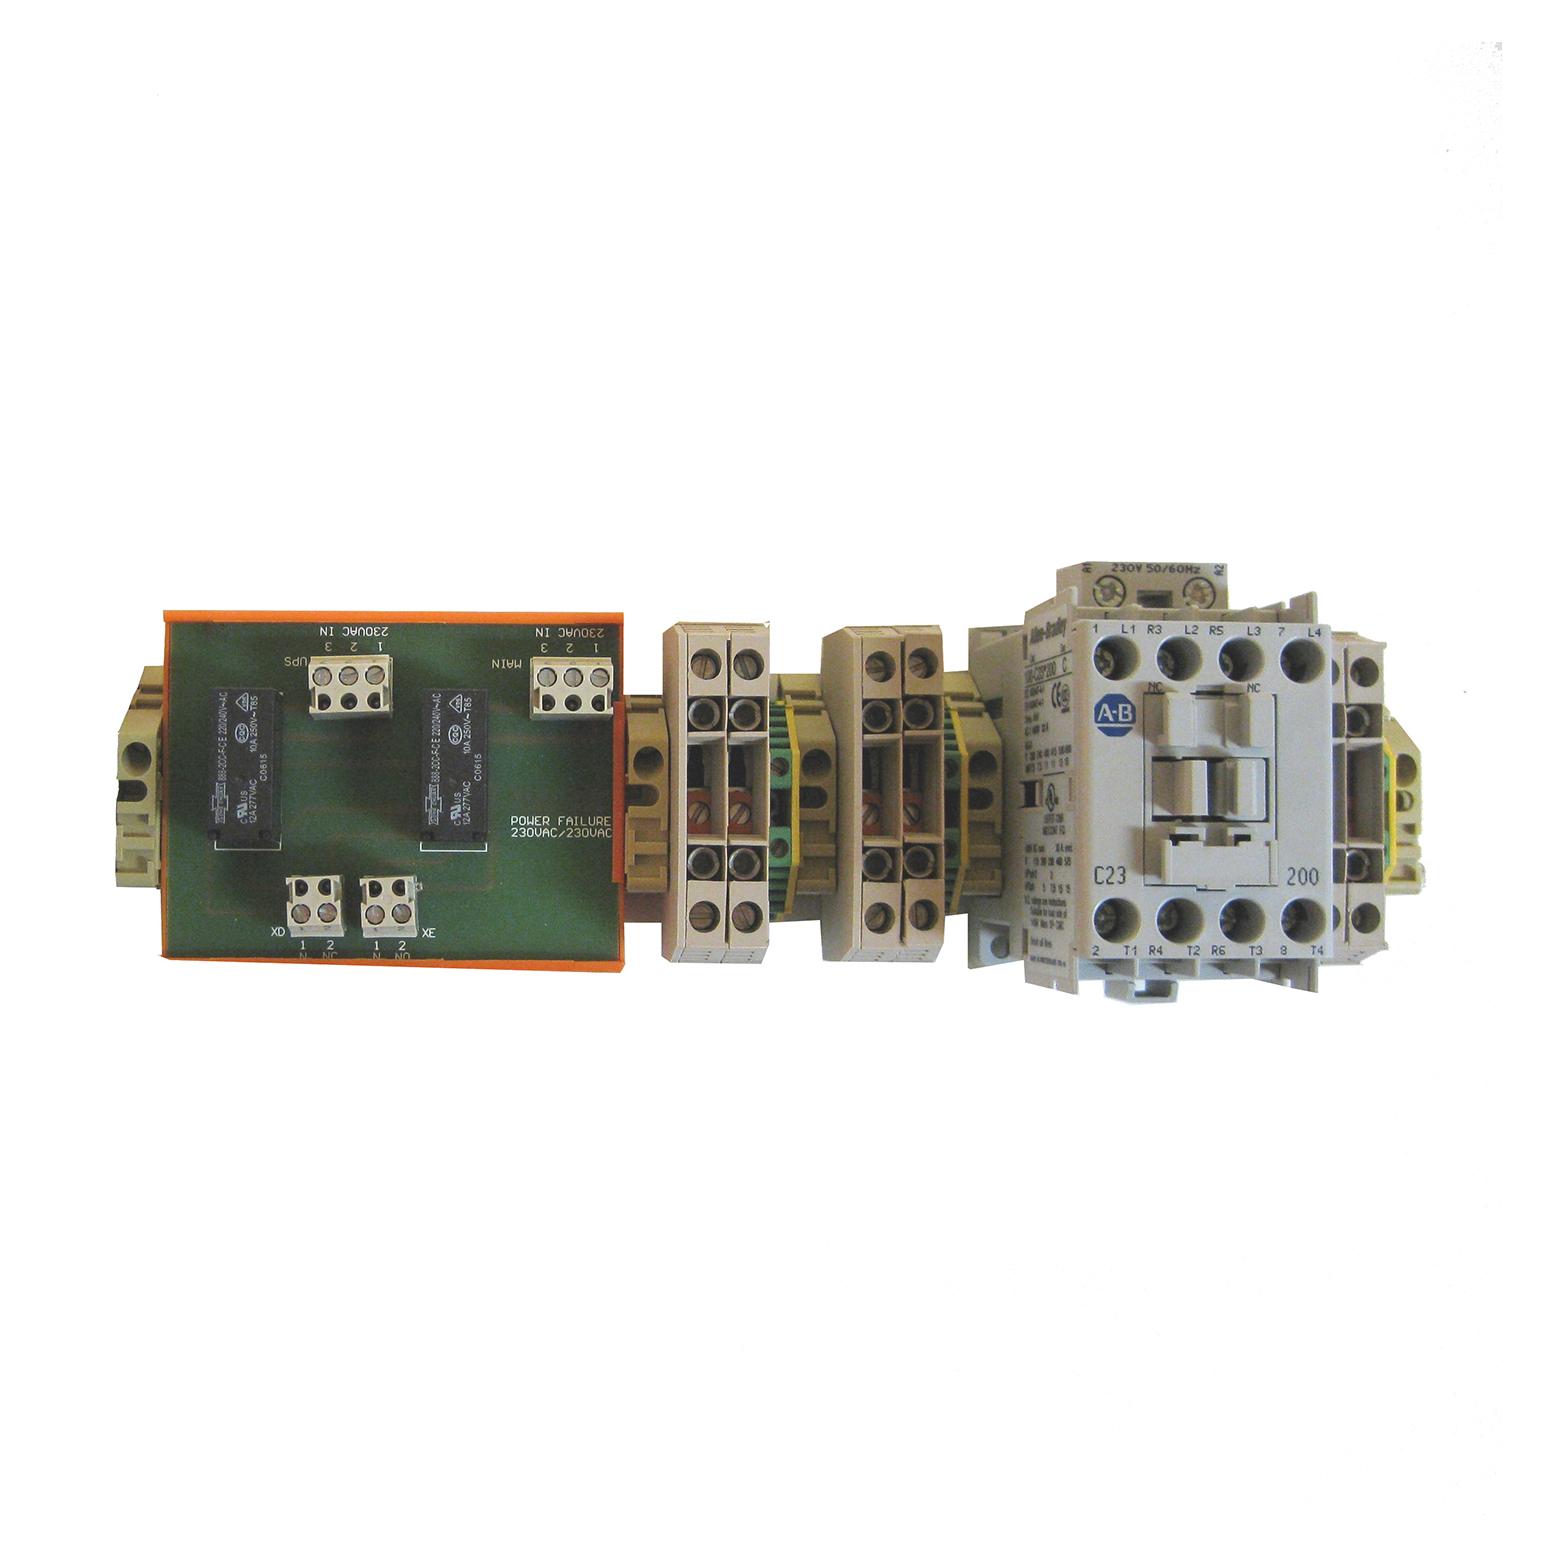 SPA-UPS Auto switch picture